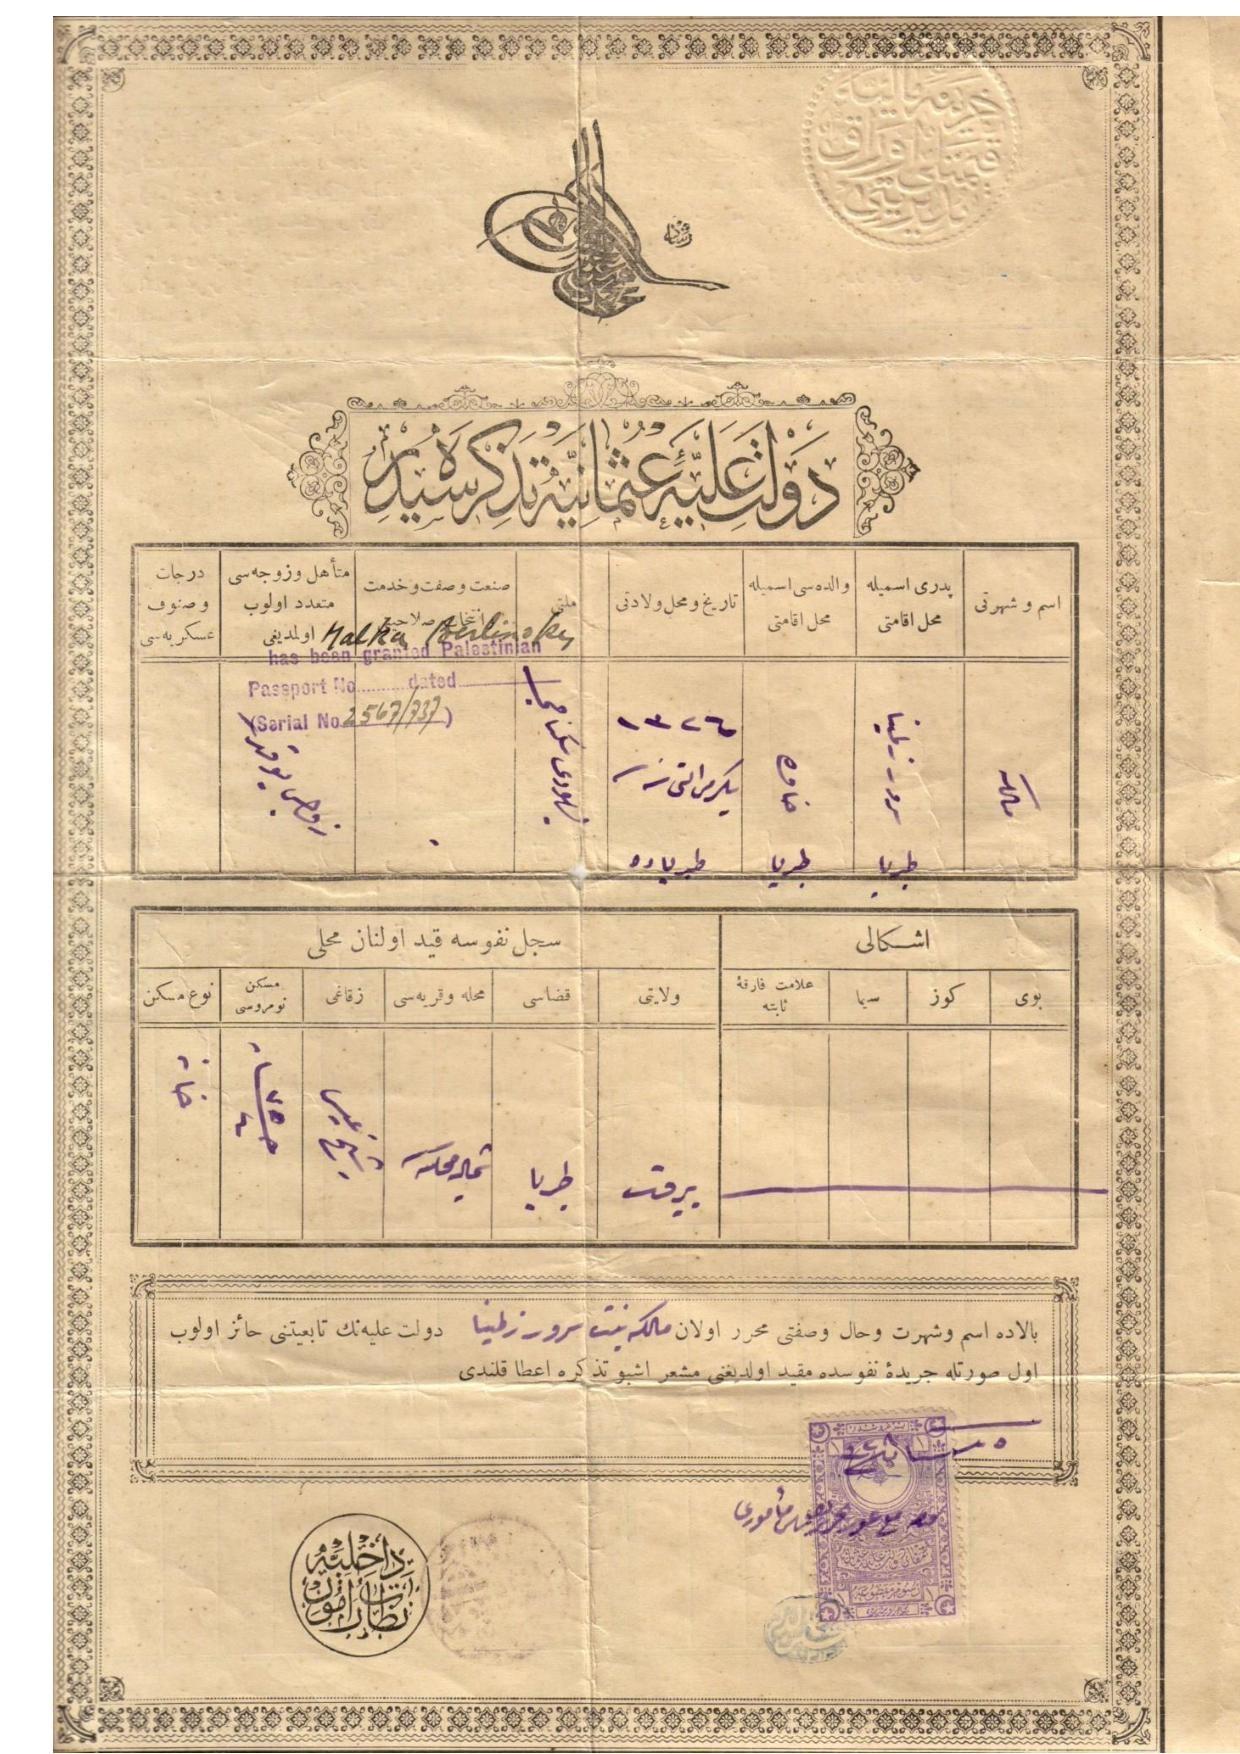 Filemalka berlinski ottoman birth certificatepdf wikimedia commons filemalka berlinski ottoman birth certificatepdf aiddatafo Images